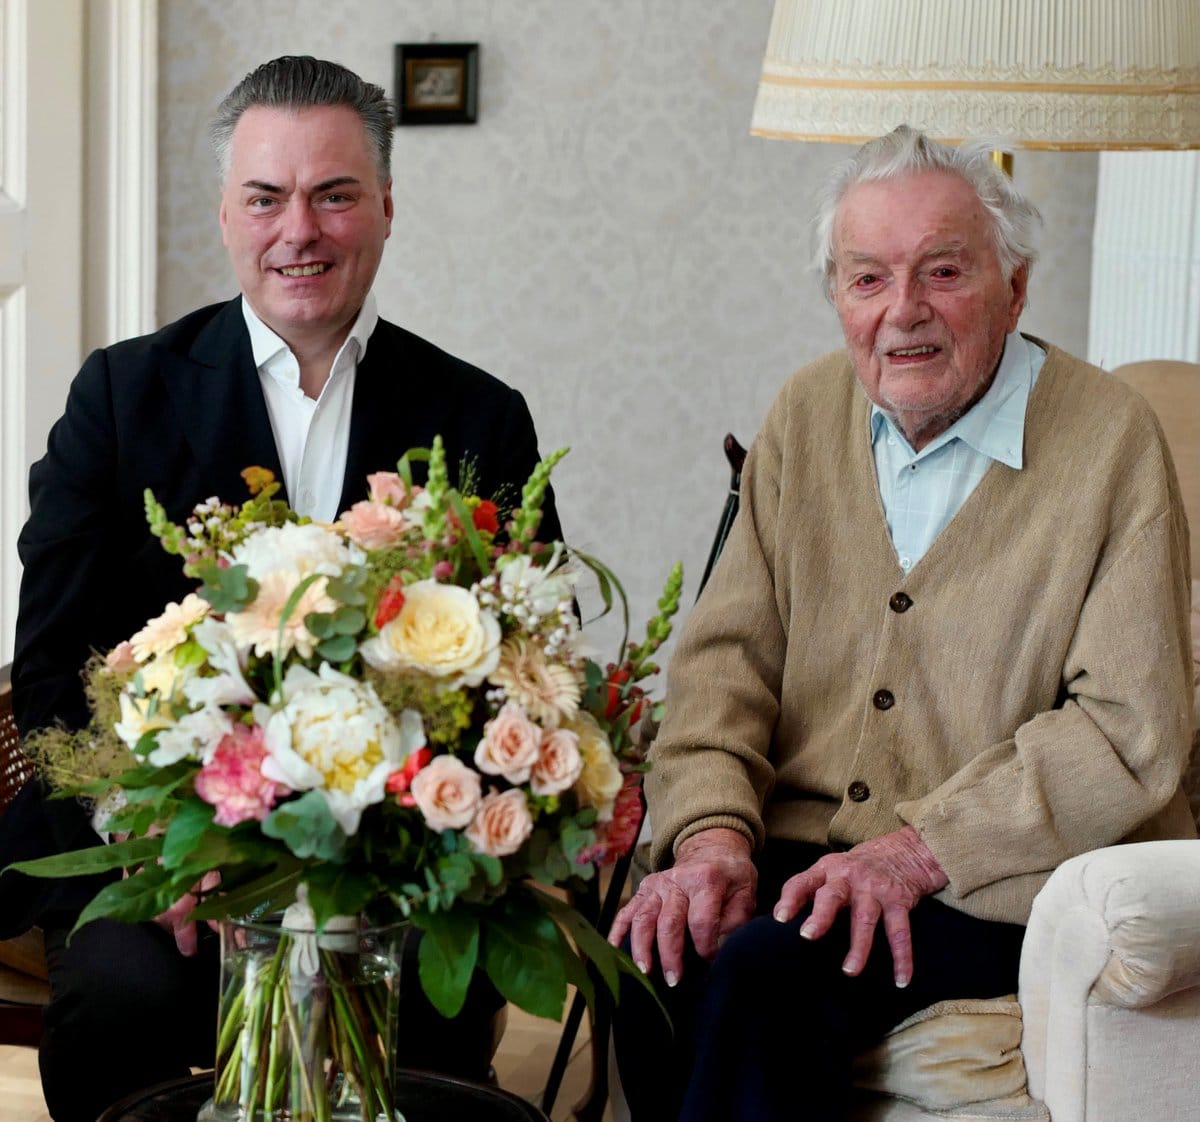 Vienna Philharmonic concertmaster turns 100